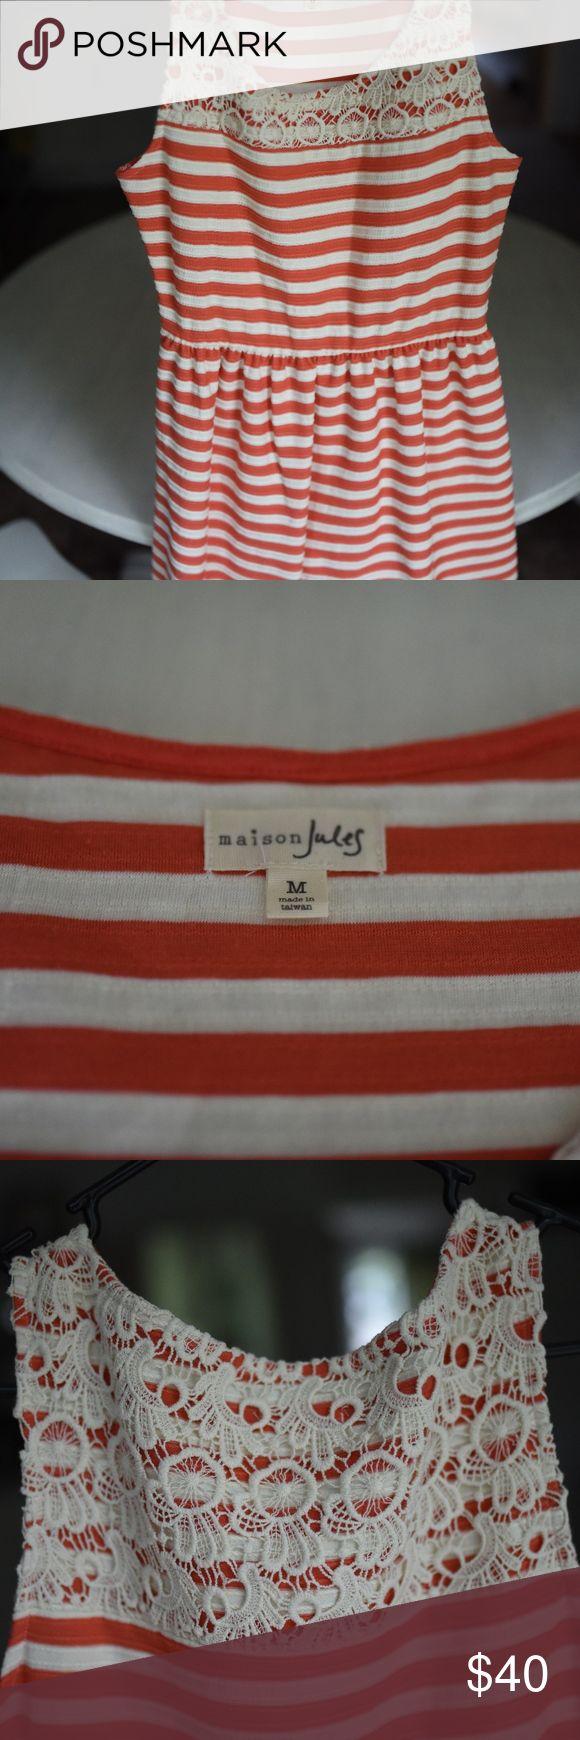 Maison Jules Striped Mini Dress Beautiful orange and white striped dress, gorgeous lace detail. Medium. Never worn, but no tags. Maison Jules Dresses Mini